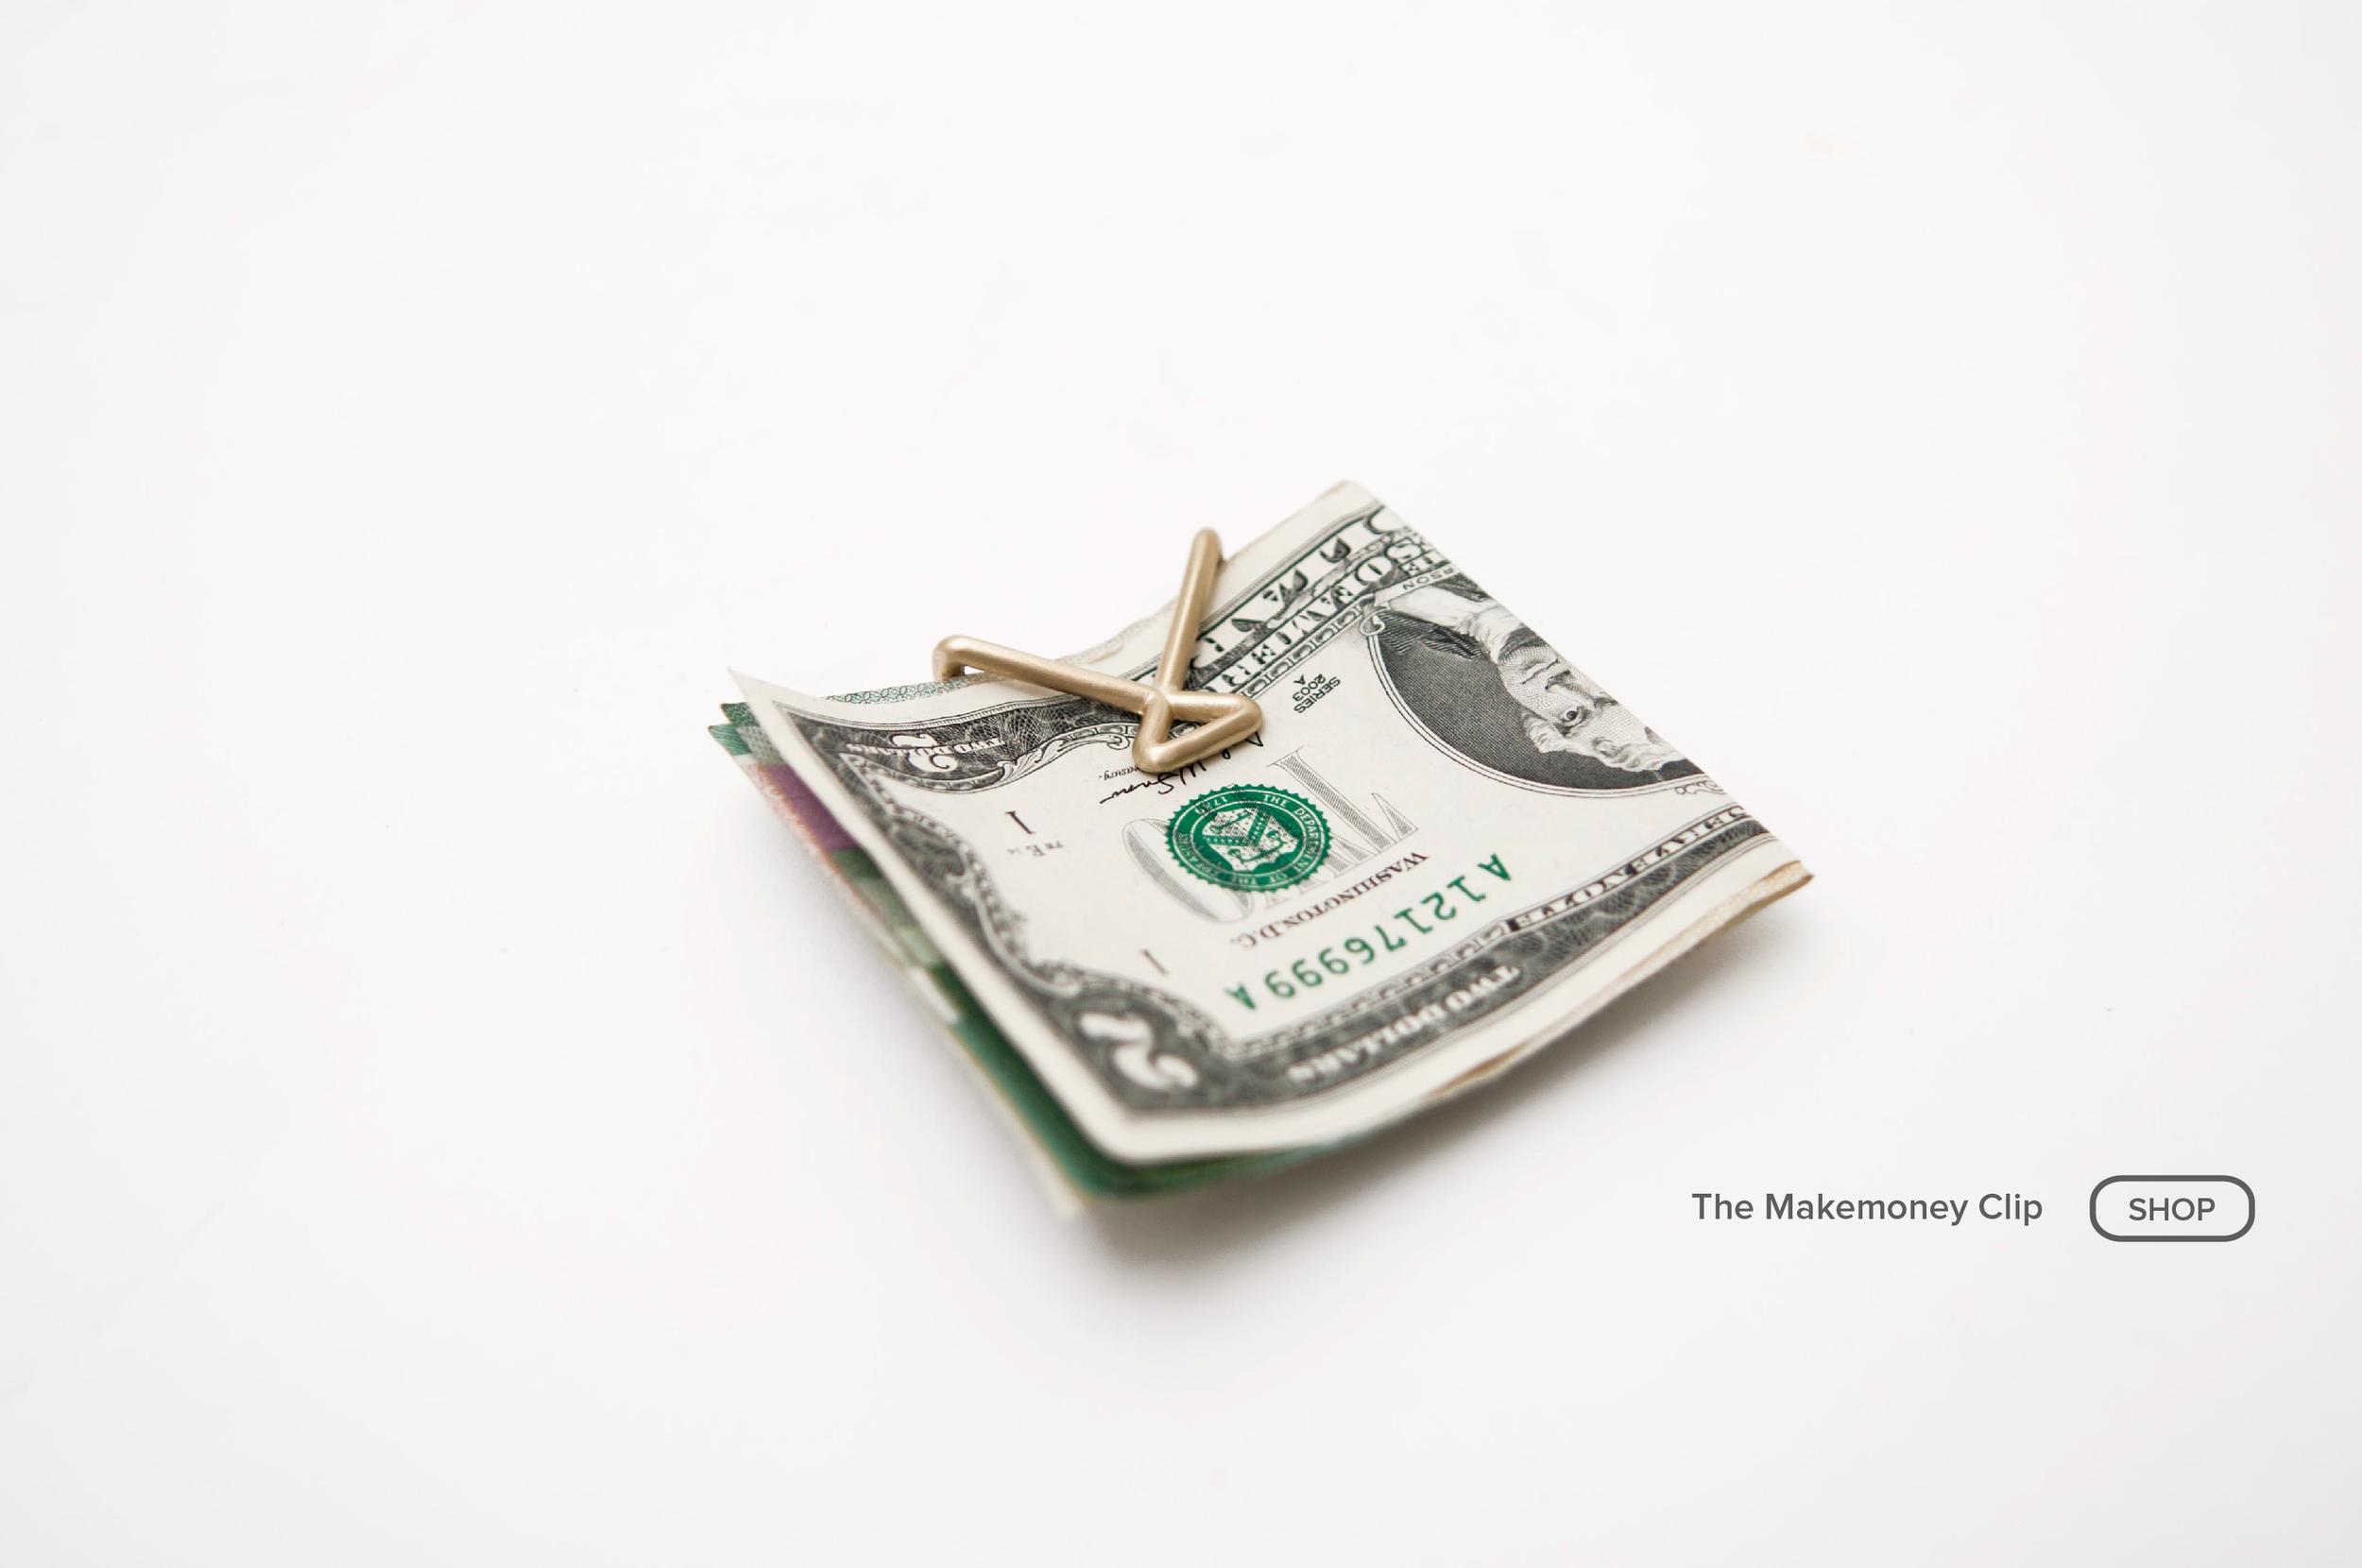 The Makemoney Clip